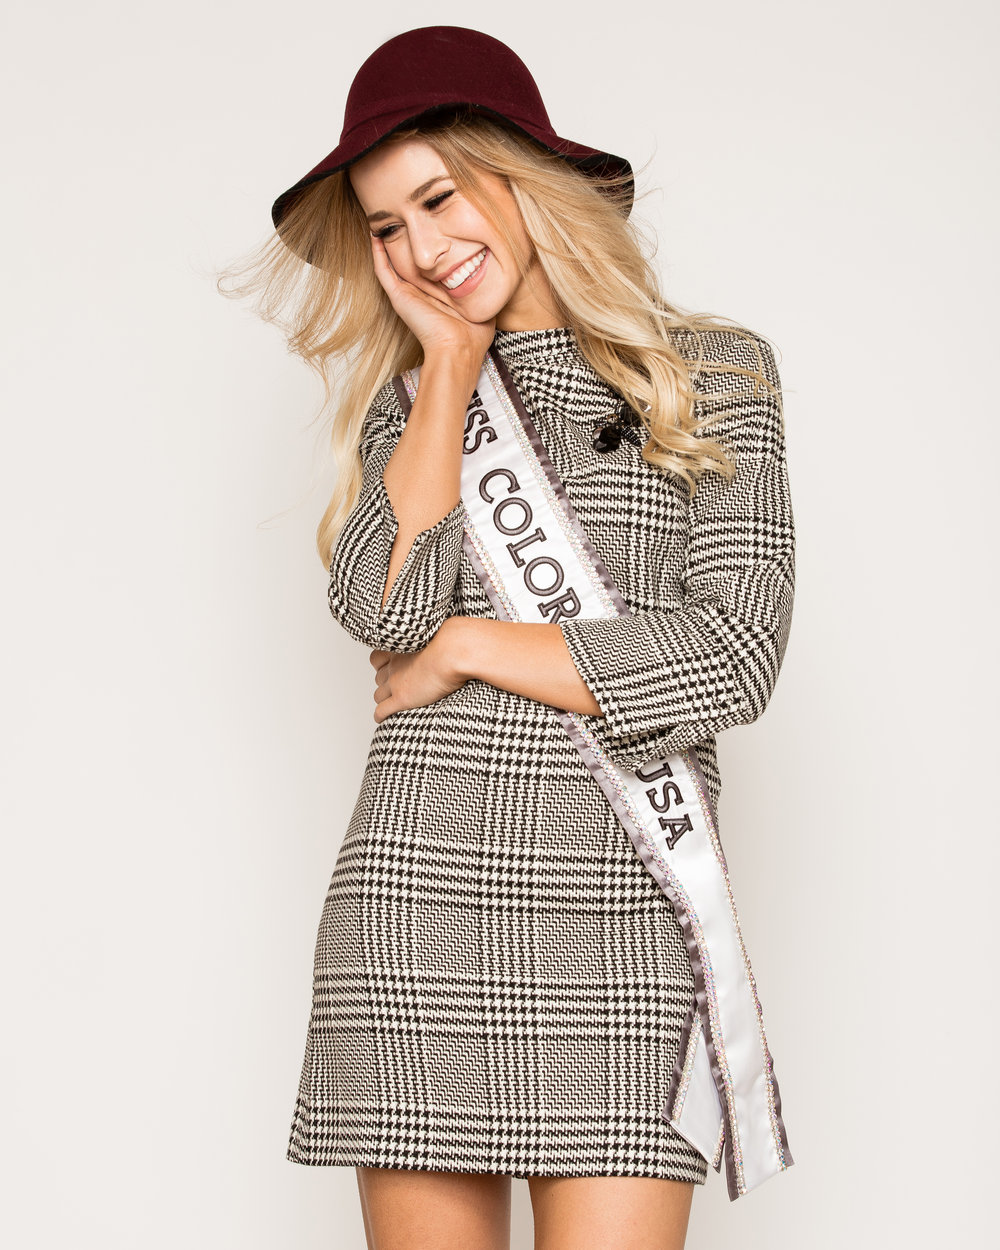 Madison - 2019 Miss Colorado USA